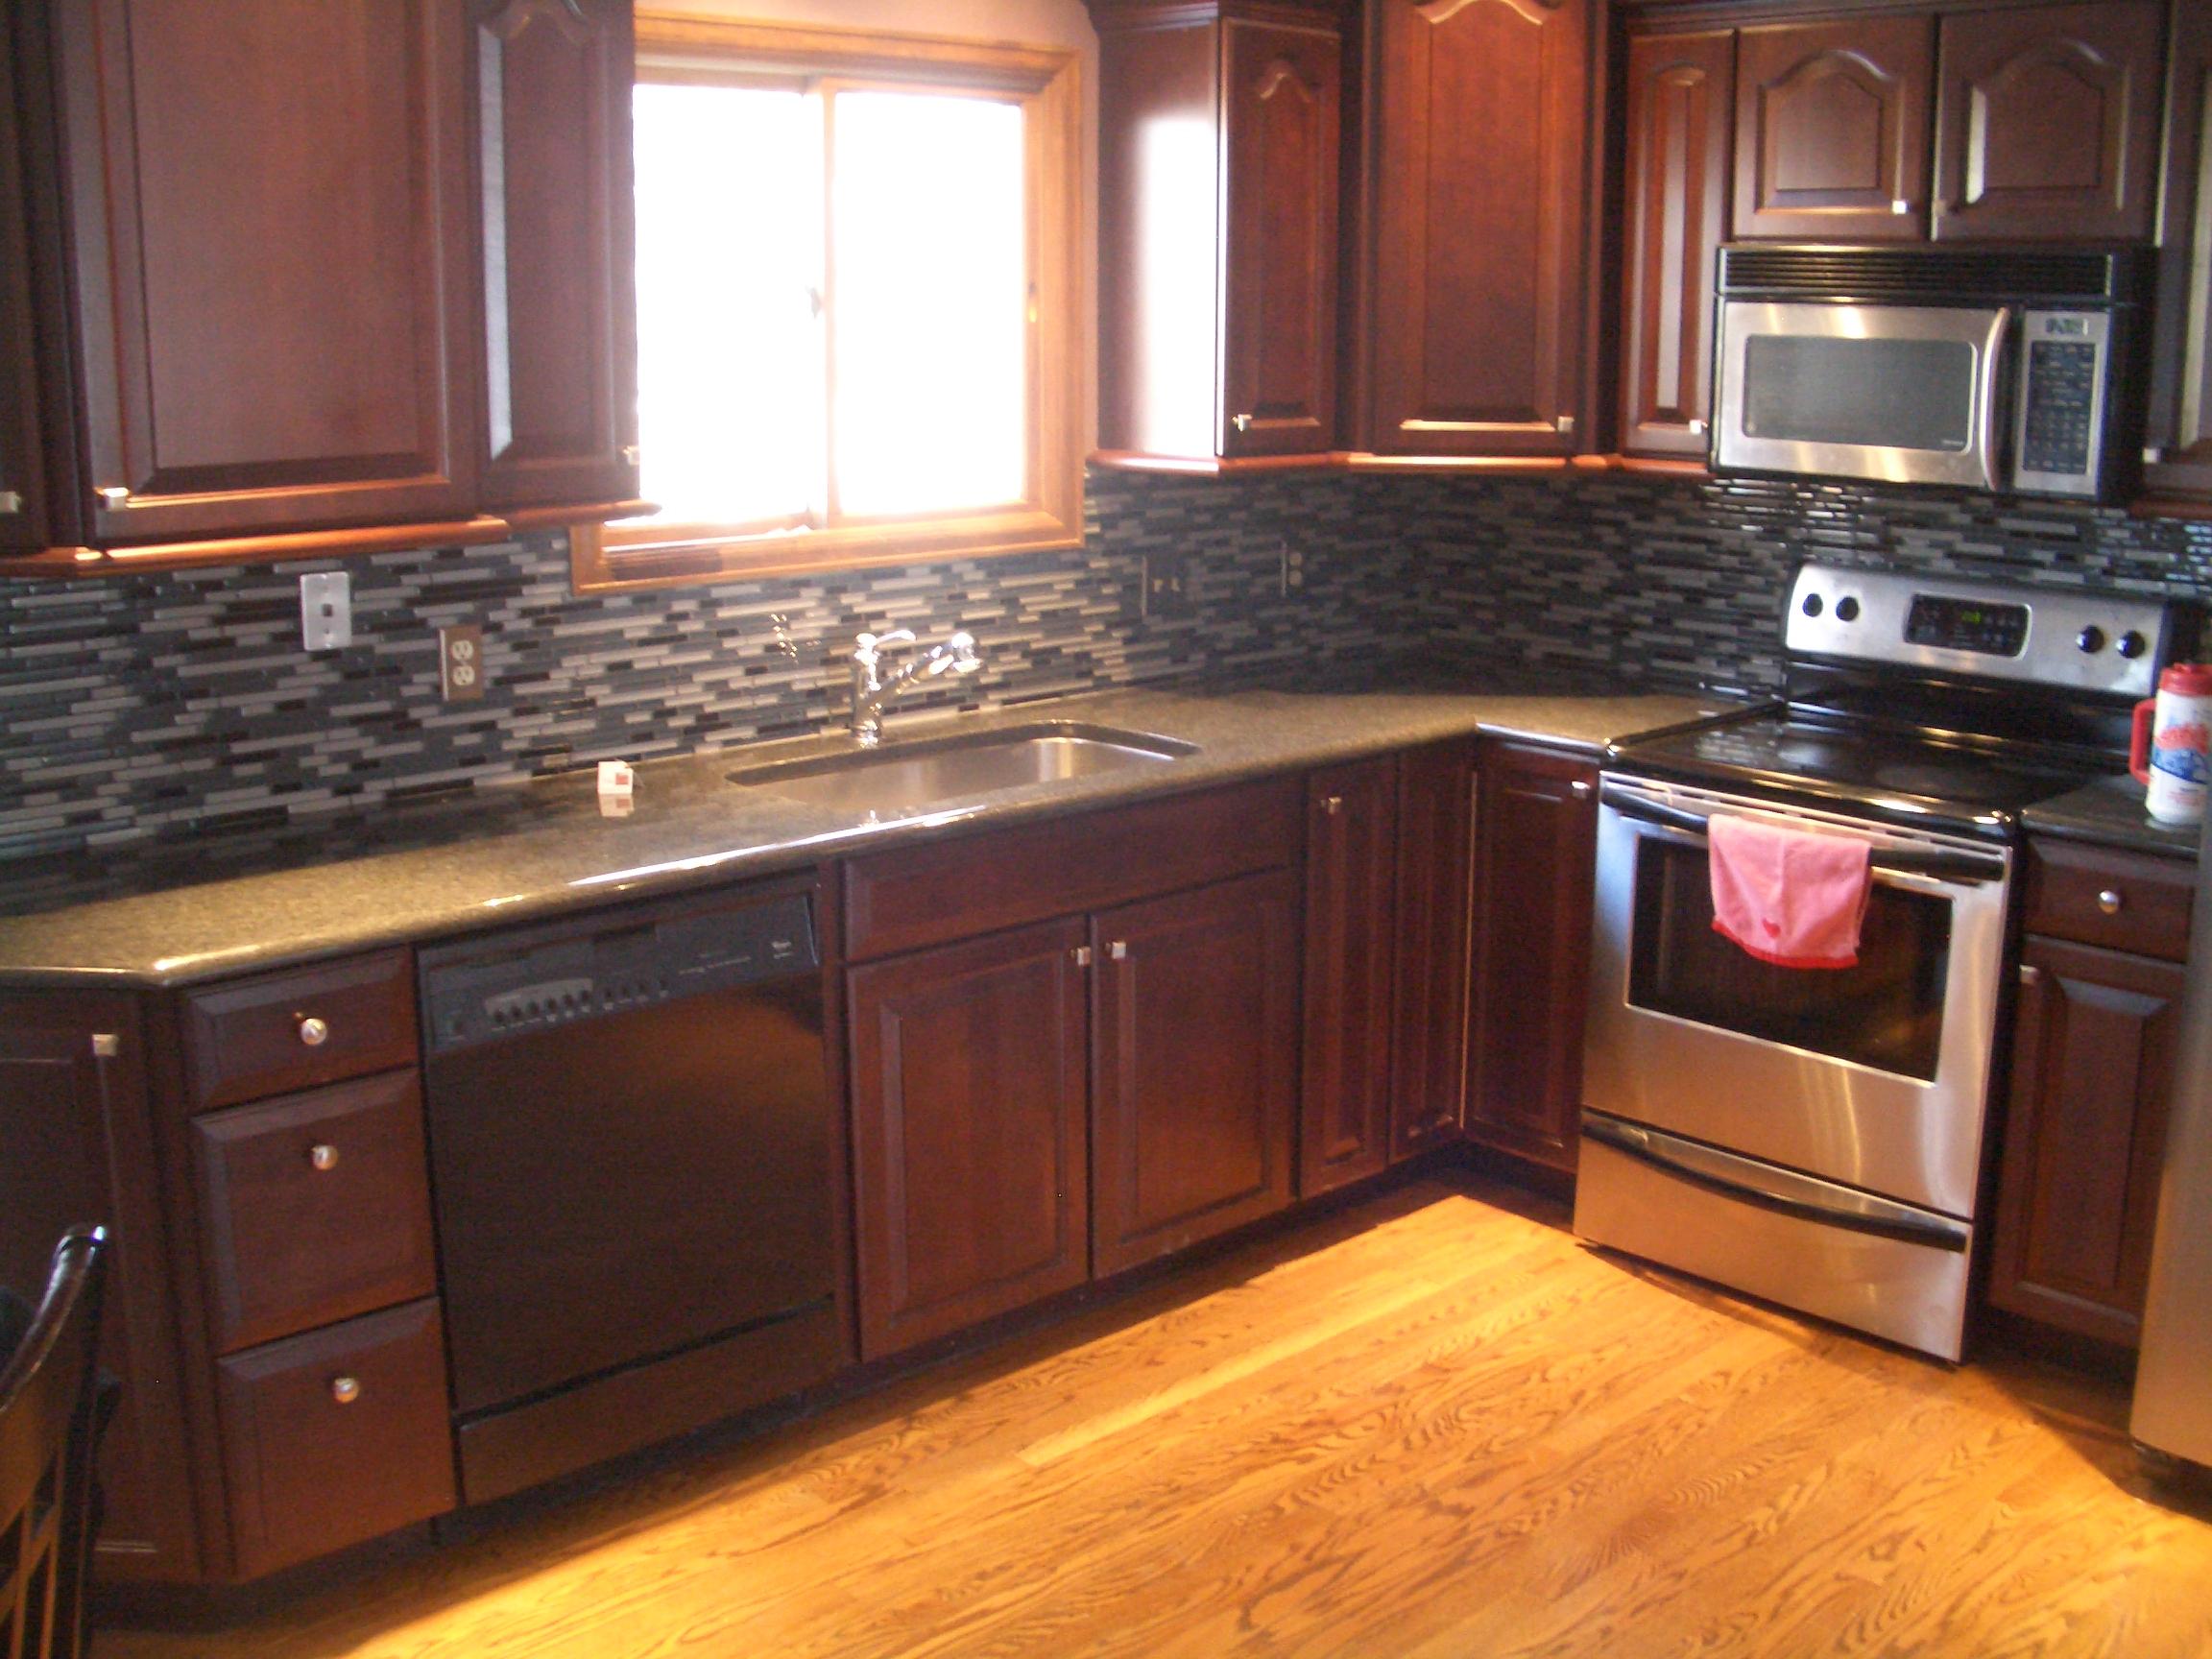 how to pick the perfect grout glass backsplash kitchen Dark glass kitchen tile backsplash in Fort Collins CO